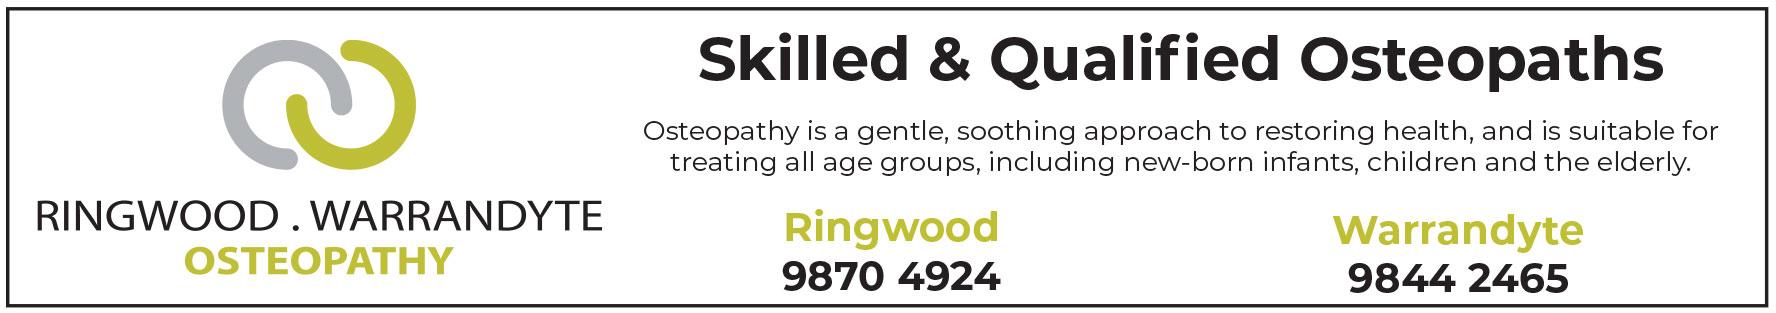 ringwood warrandyte osteo